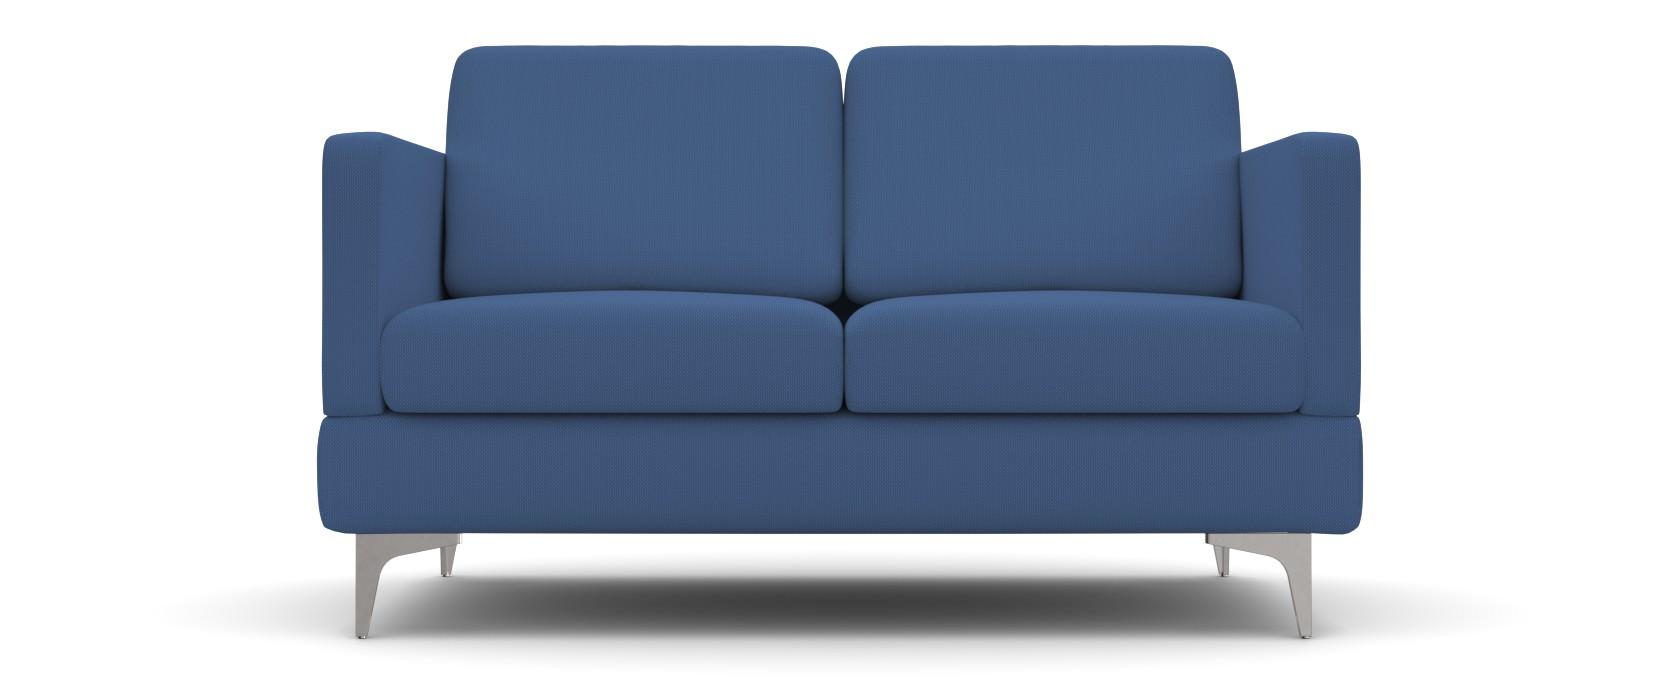 2-Sitzer Sofa Manfredo Club